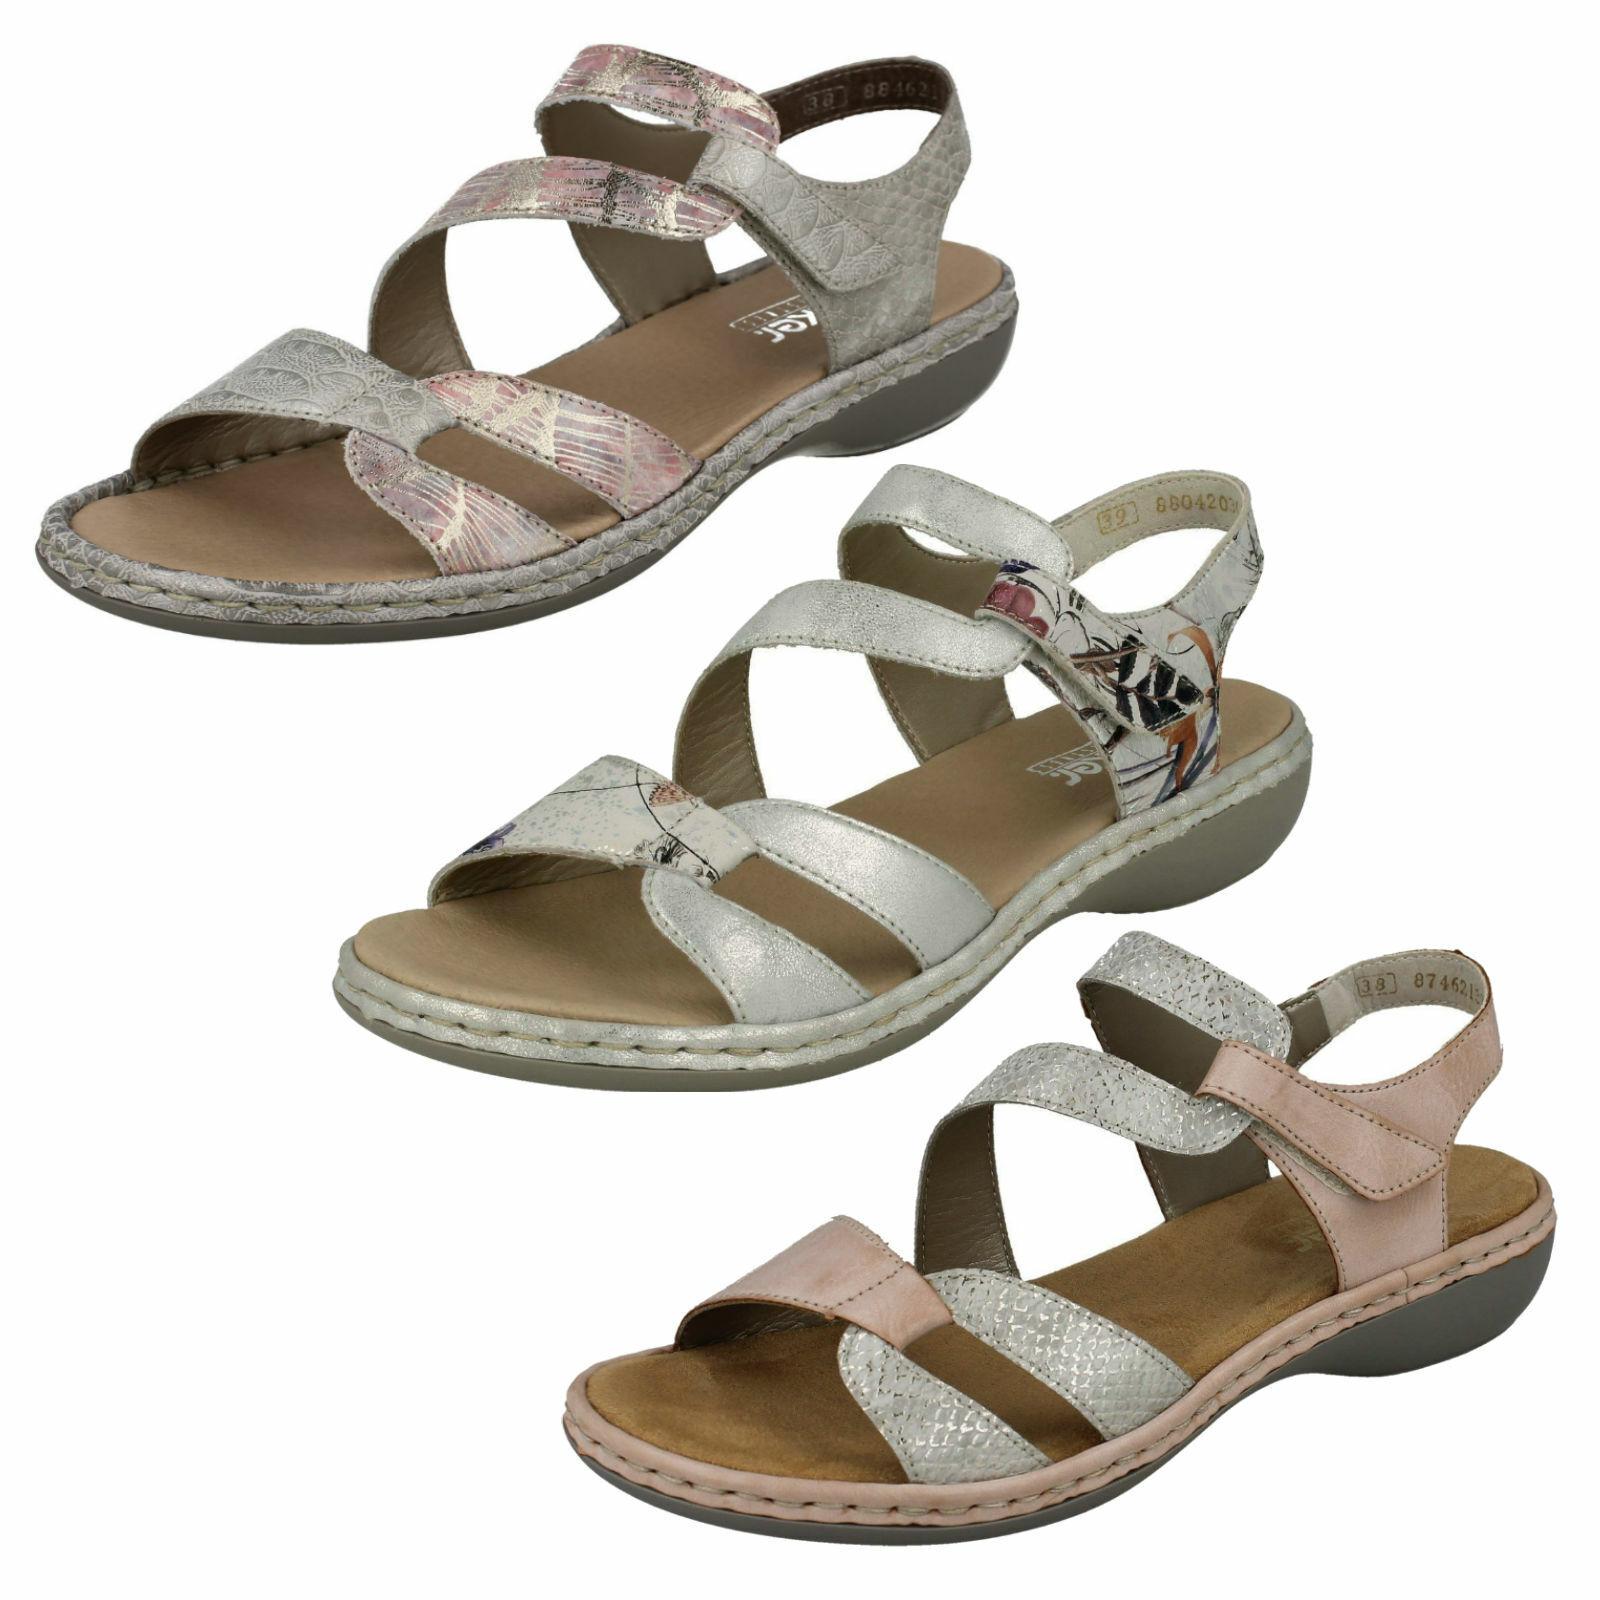 Rieker Womens Peep Toe Strappy Strap Leisure Soft Beach Summer Sandals